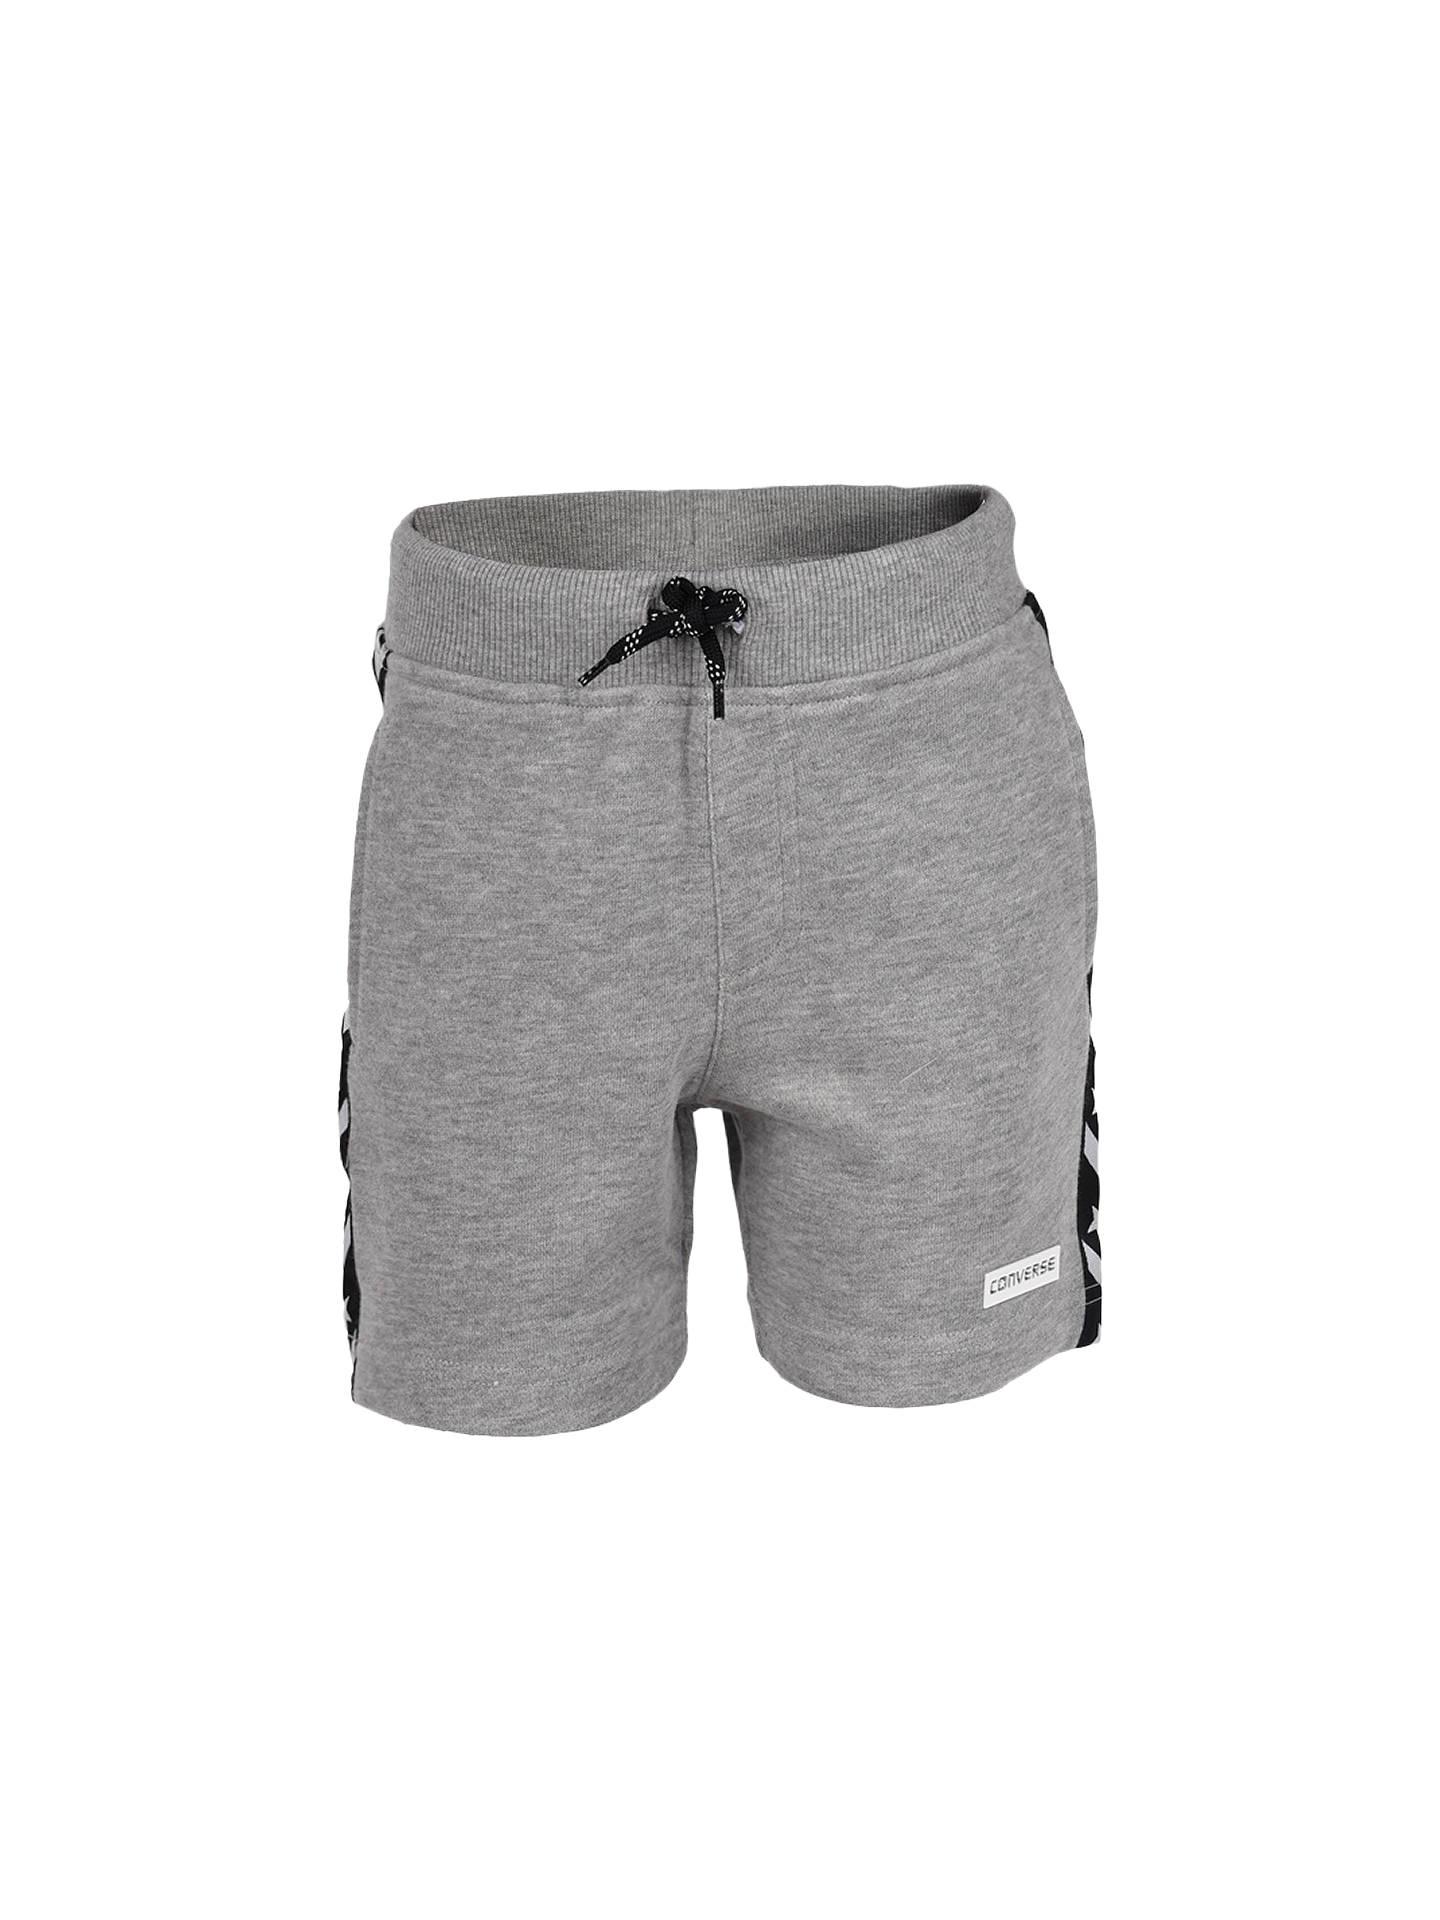 e810f43f5f9394 Buy Converse Boys  Star Chevron Shorts